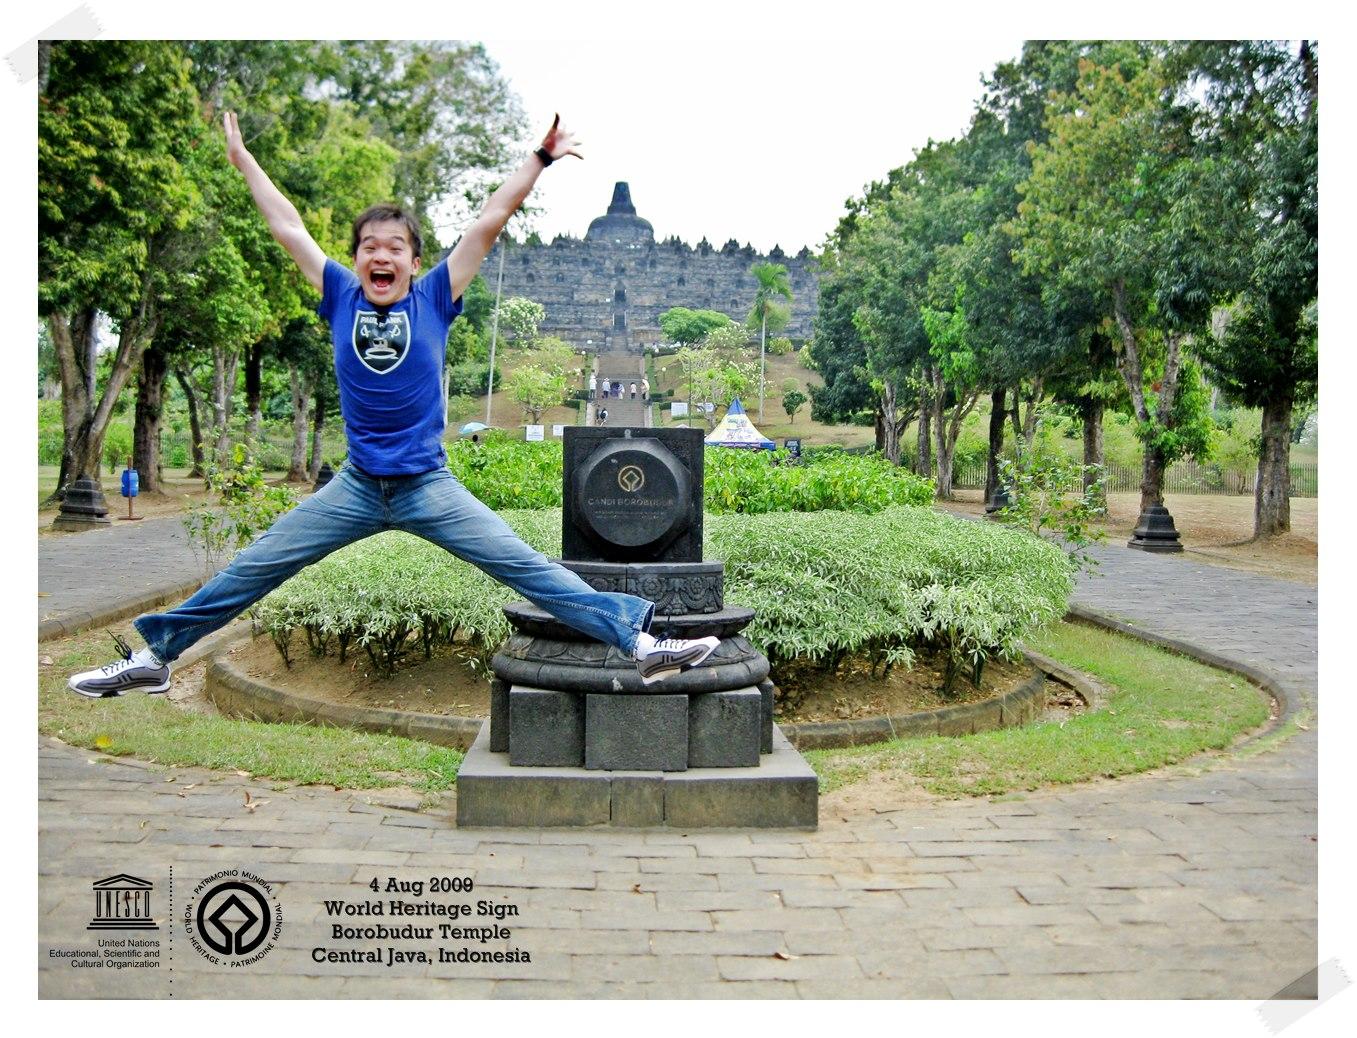 Star Jump at Borobudur Temple Borobudur Temple Compounds - Indonesia Thomas shaw